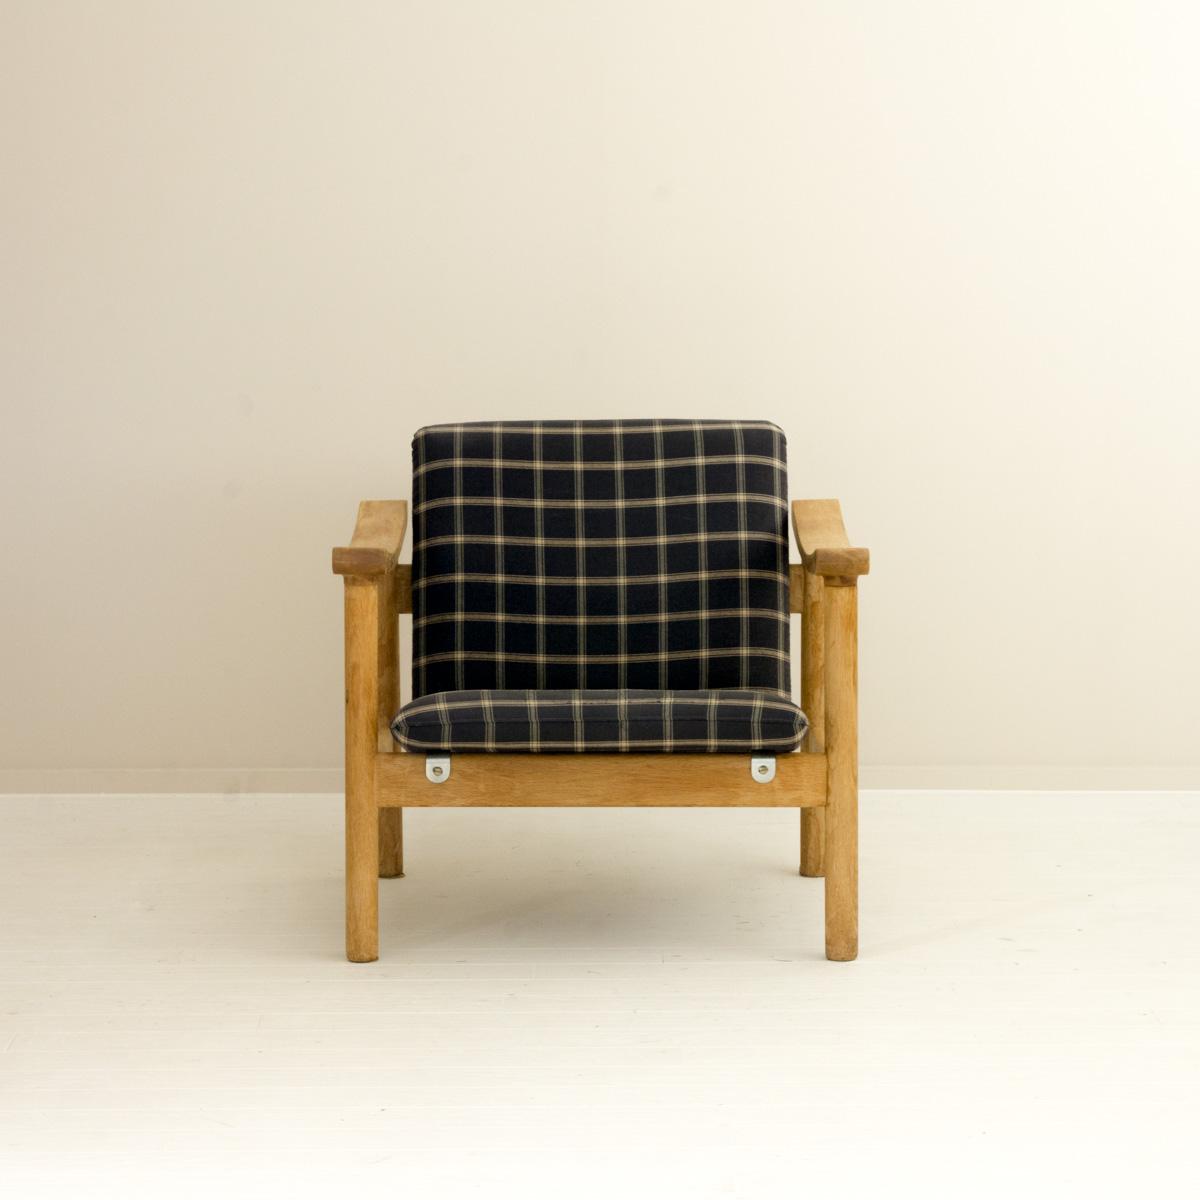 GE280 Easy Chair by Hans J Wegner